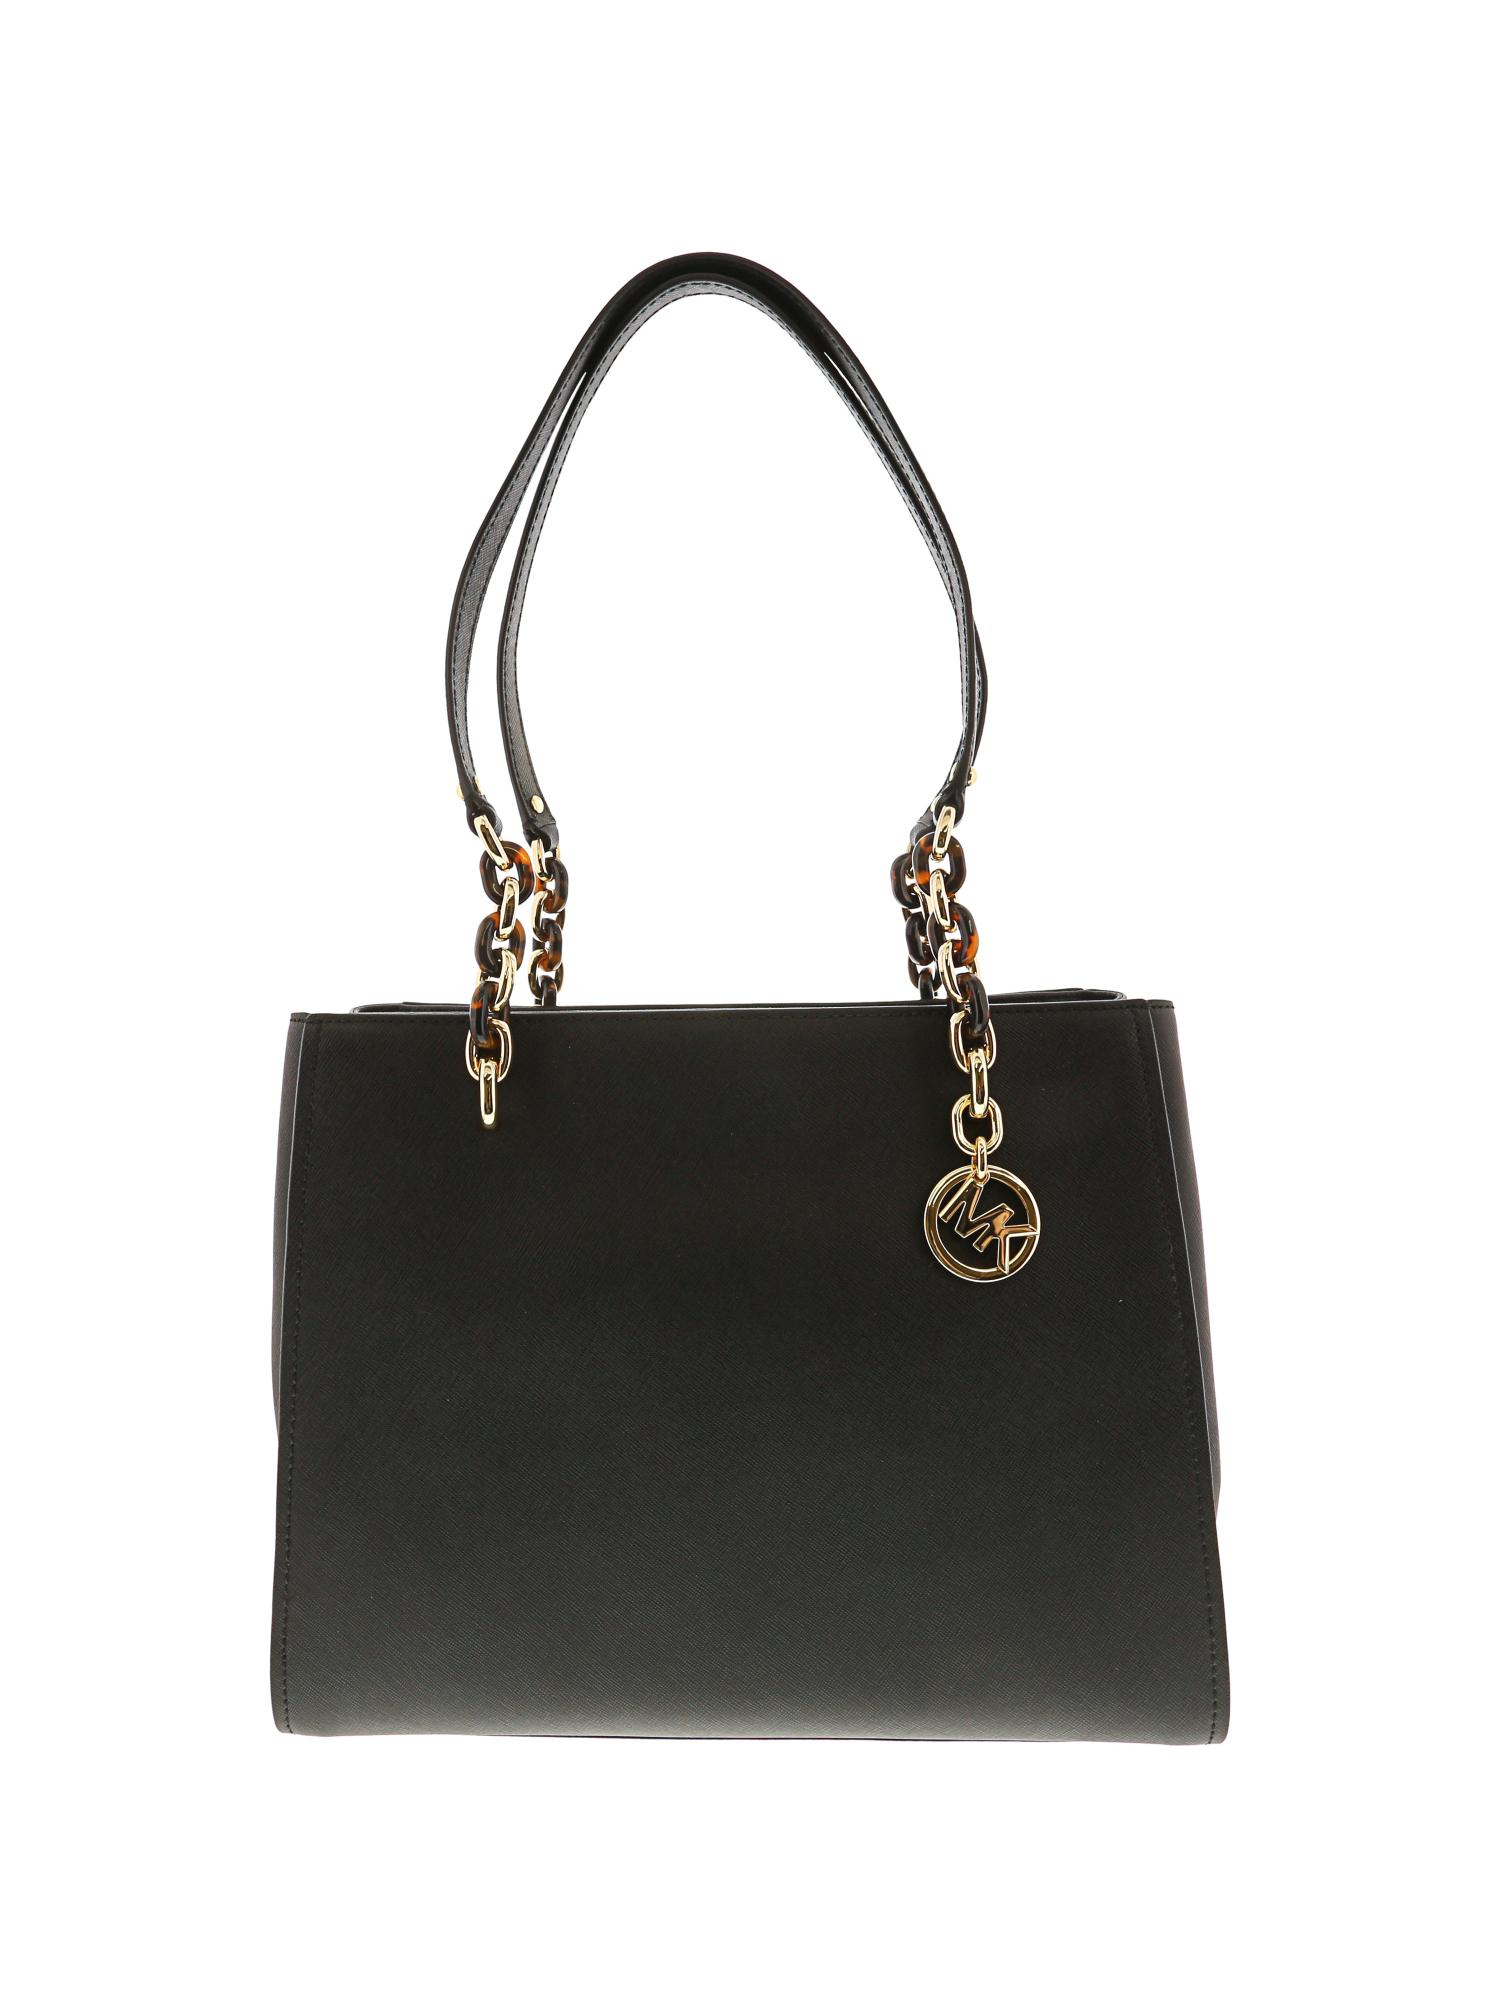 44426279663607 Michael Kors Bag Sofia MD Tote Leather Black 35f8go5t3l for sale ...